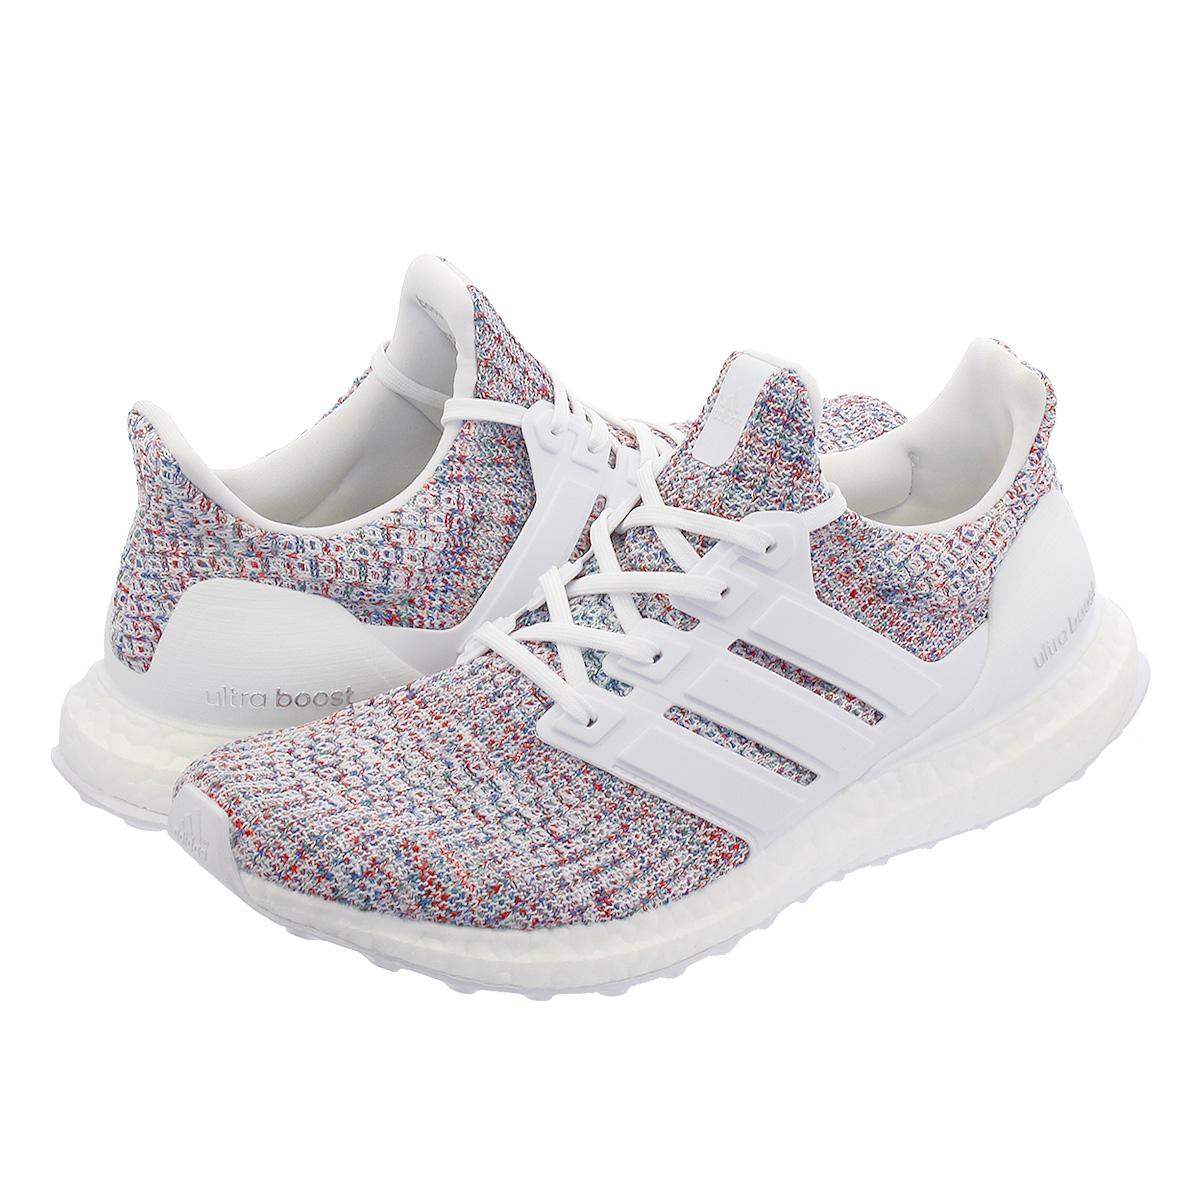 newest e5f4b 068c2 adidas ULTRA BOOST Adidas ultra boost RUNNING WHITE/RUNNING WHITE/BLUE  db3198